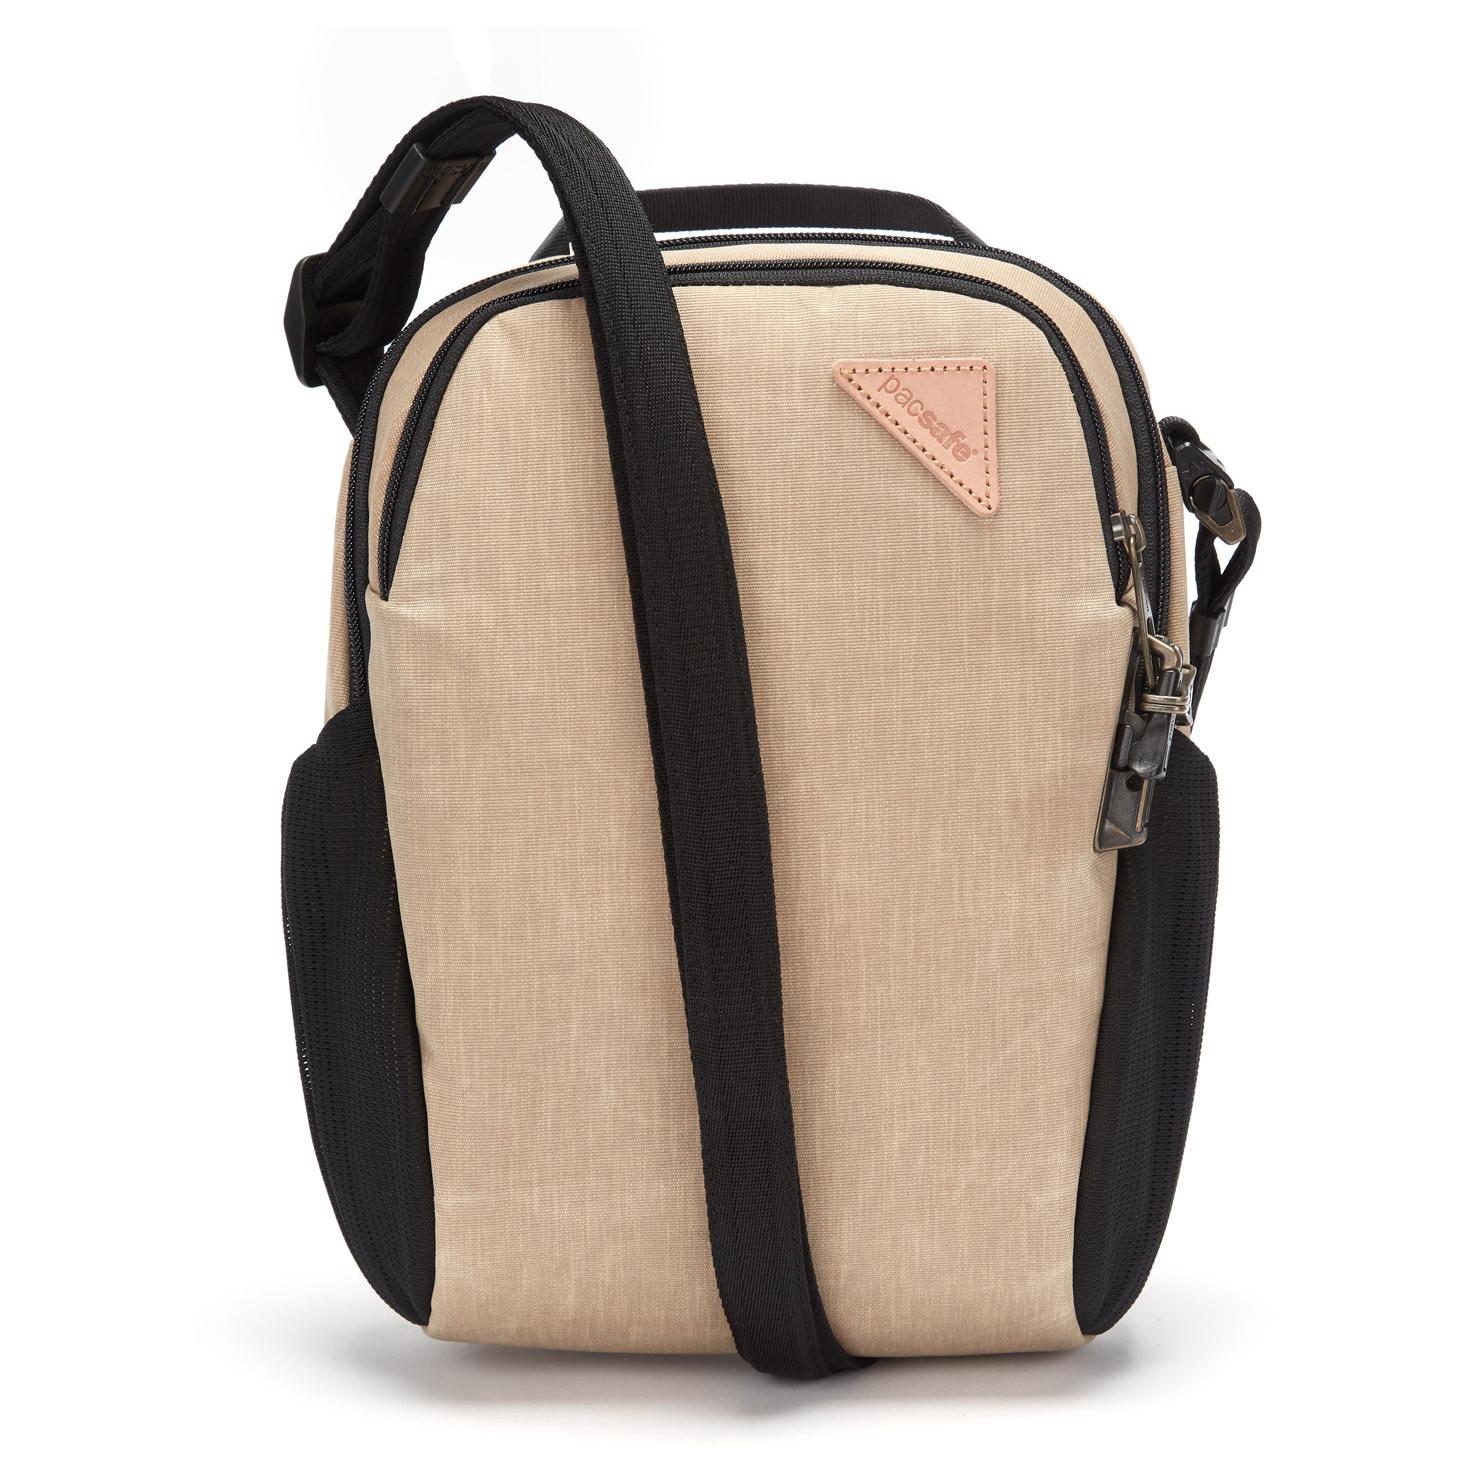 Pacsafe Vibe 200 7,5 l Shoulder bag Jet Black | 7,5 l